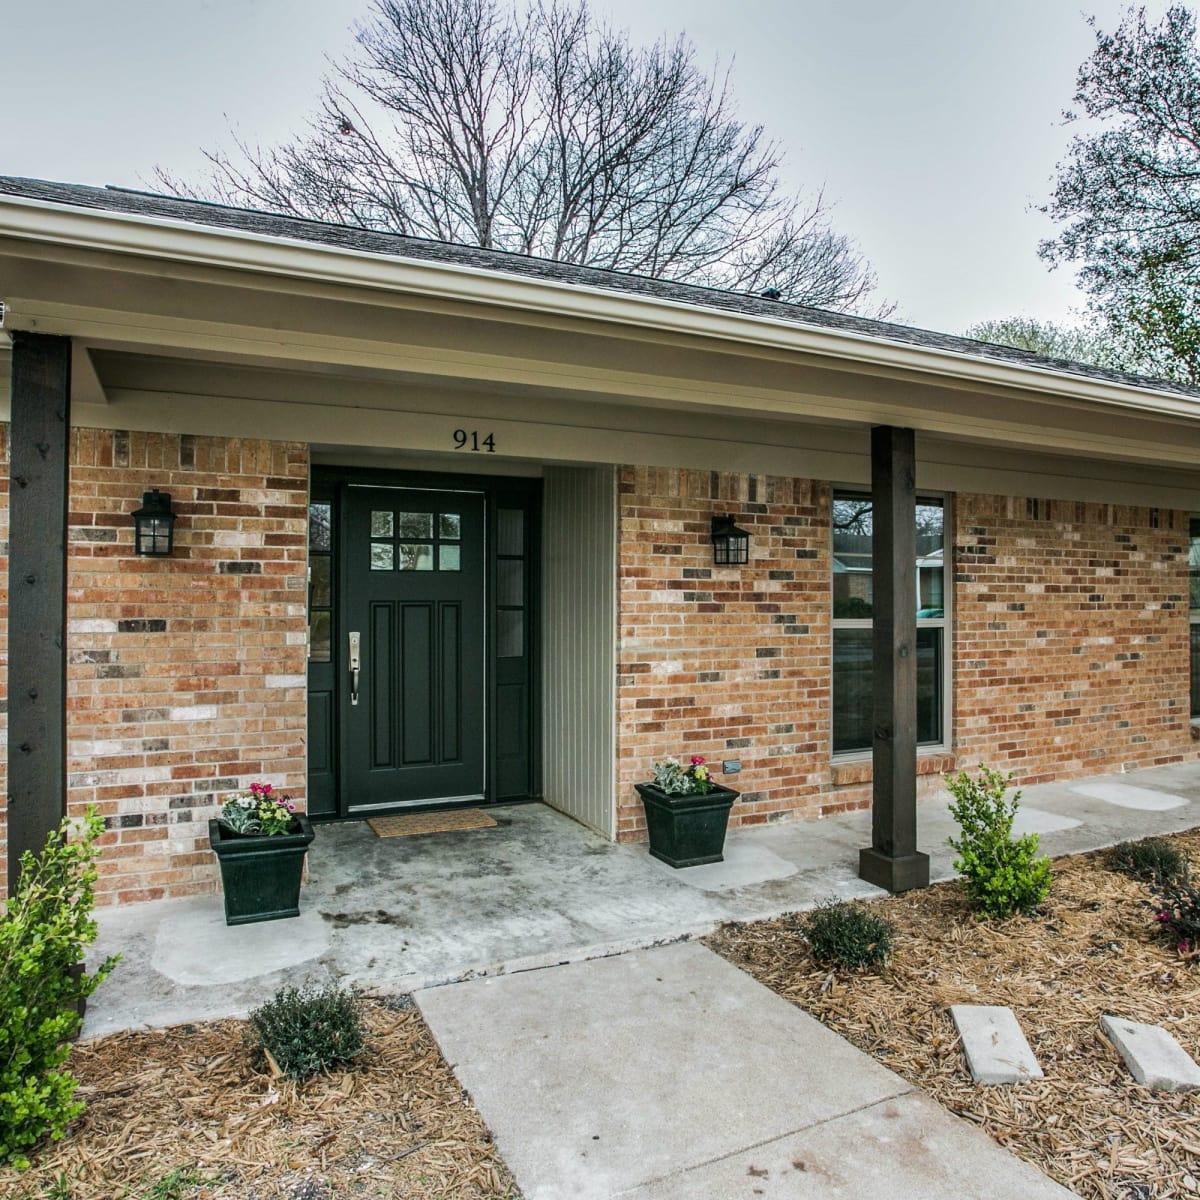 914 Sandalwood Dallas house for sale